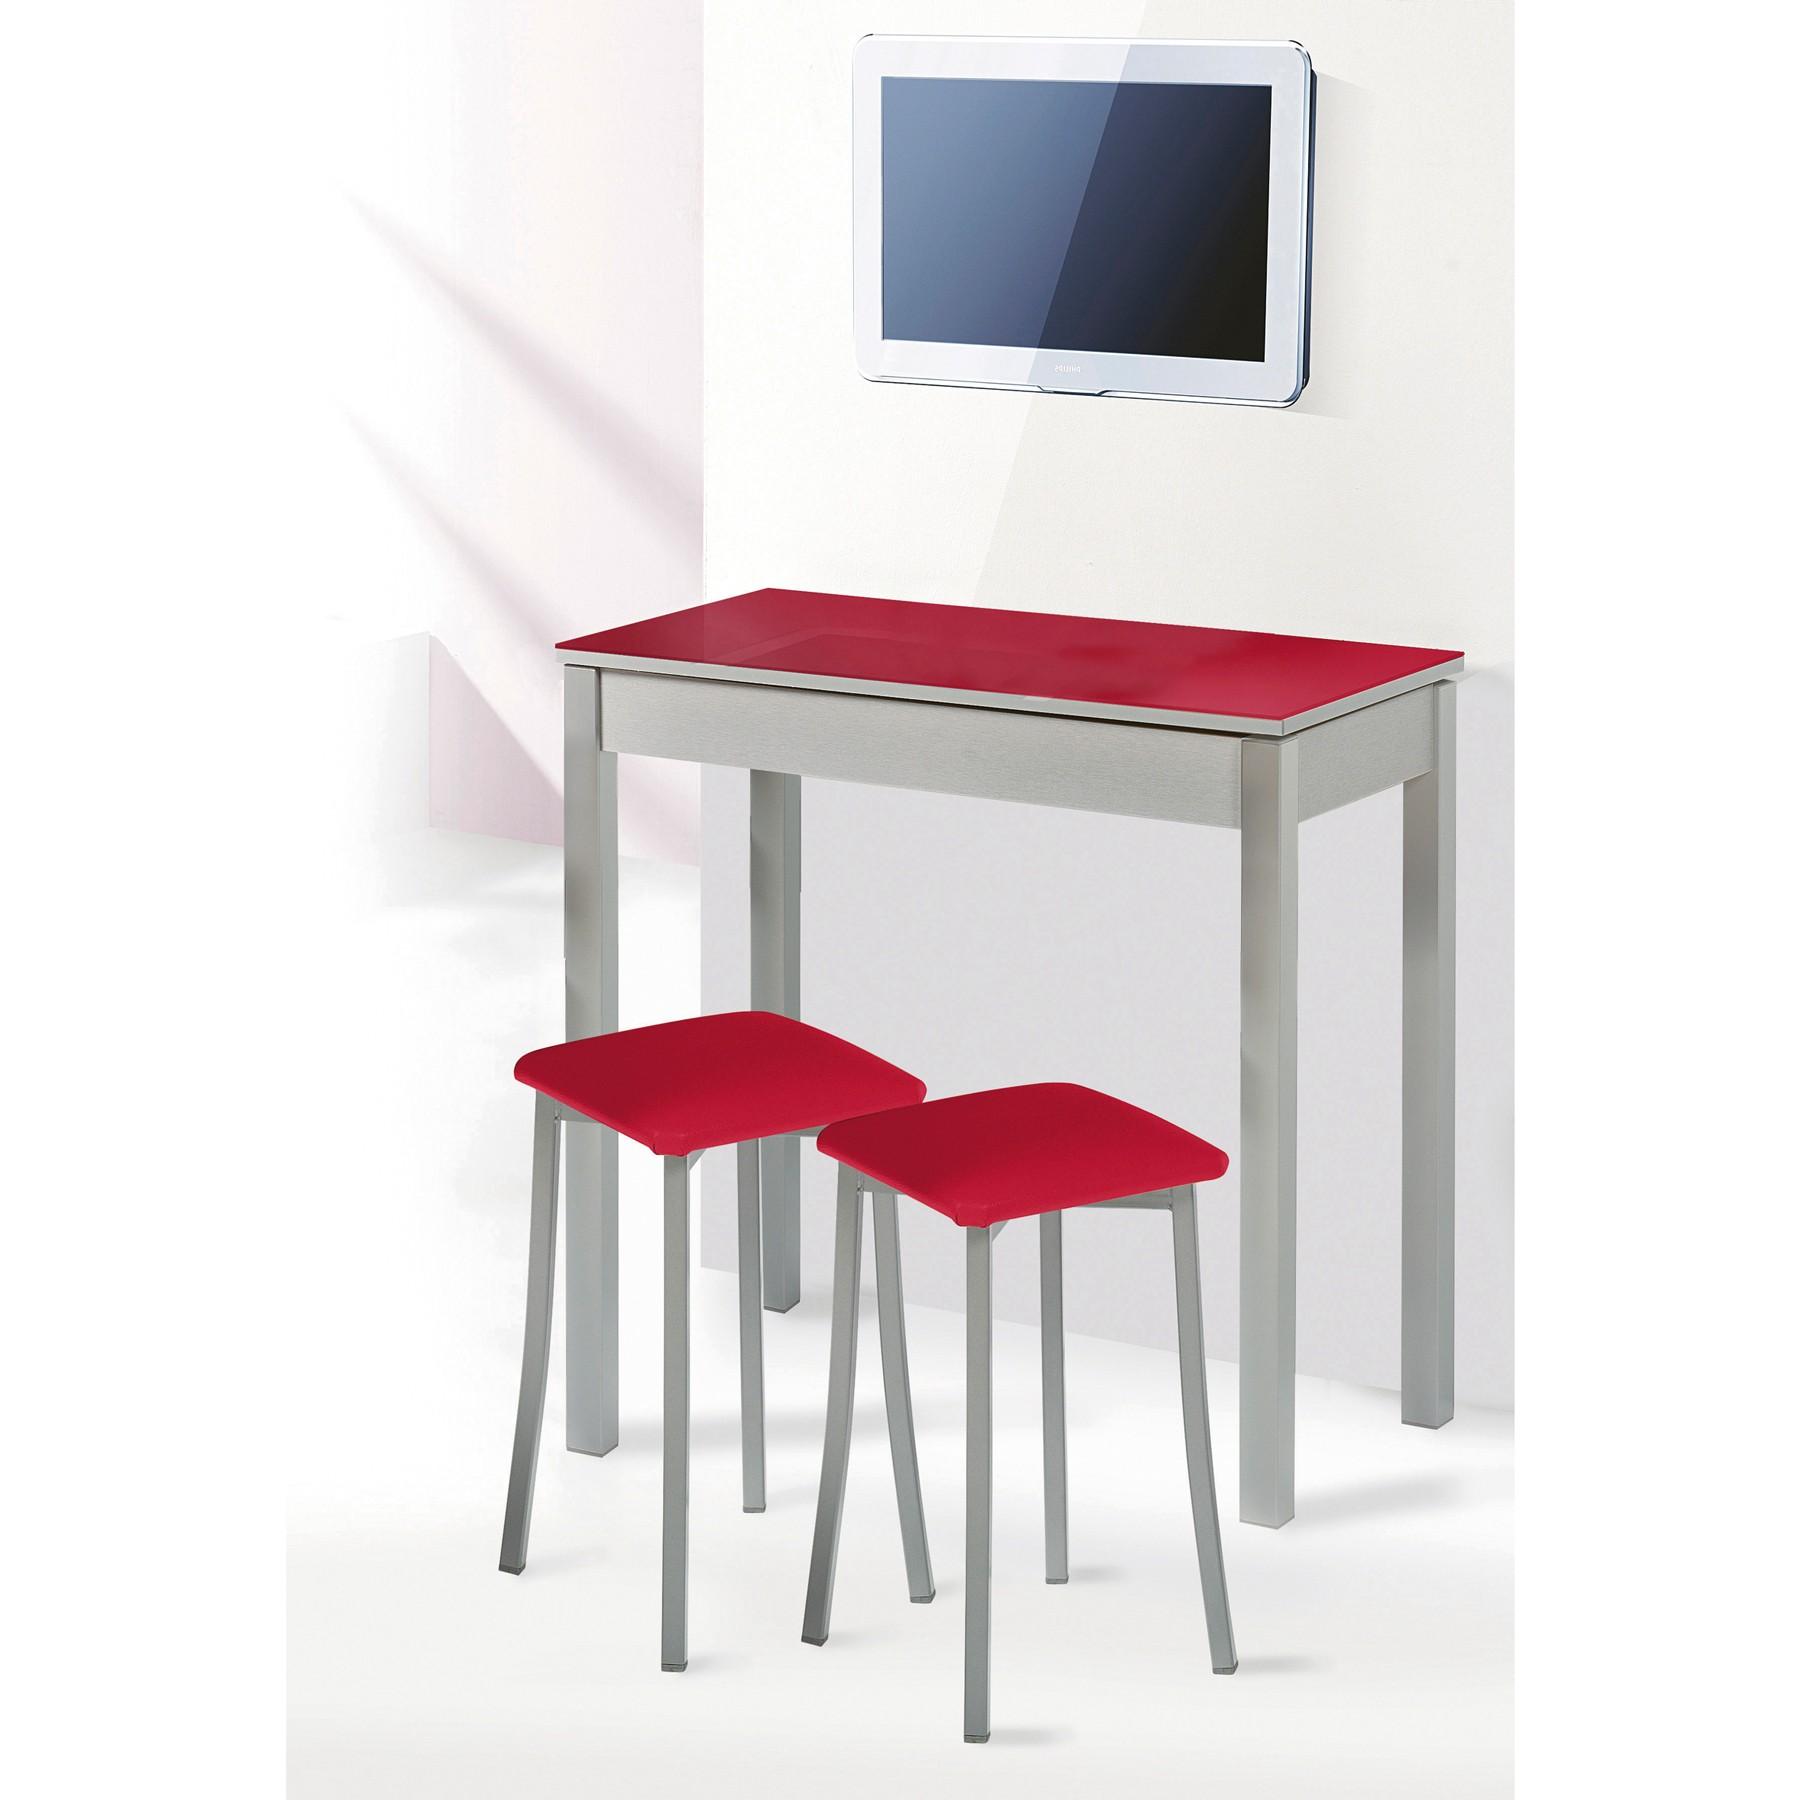 Mesa de cocina fija y taburetes modelo liborno espacios for Mesas de cocina pequenas